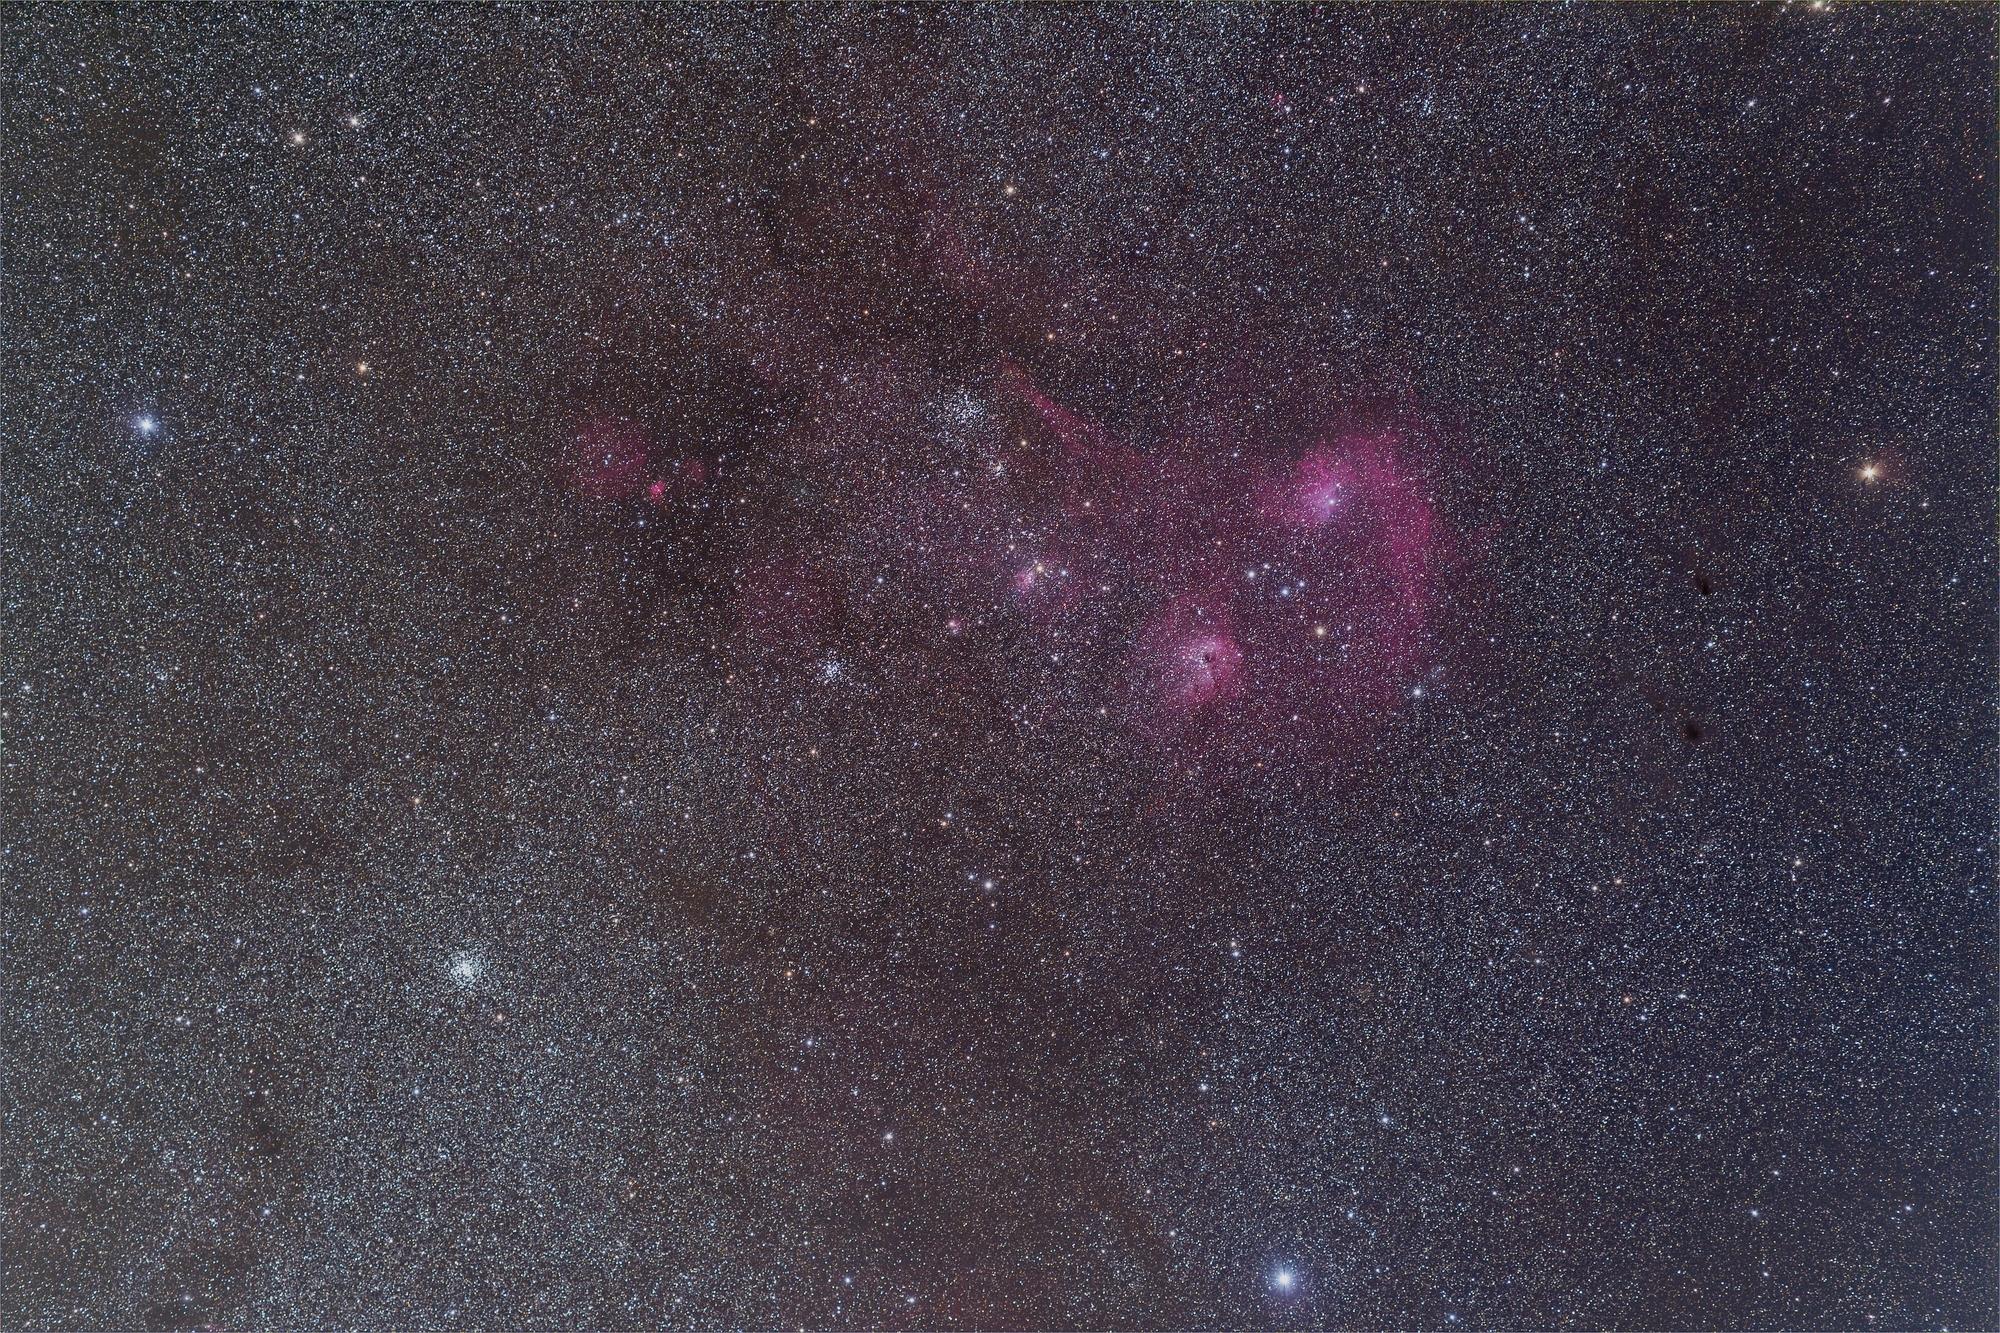 f:id:snct-astro:20201014215023j:plain